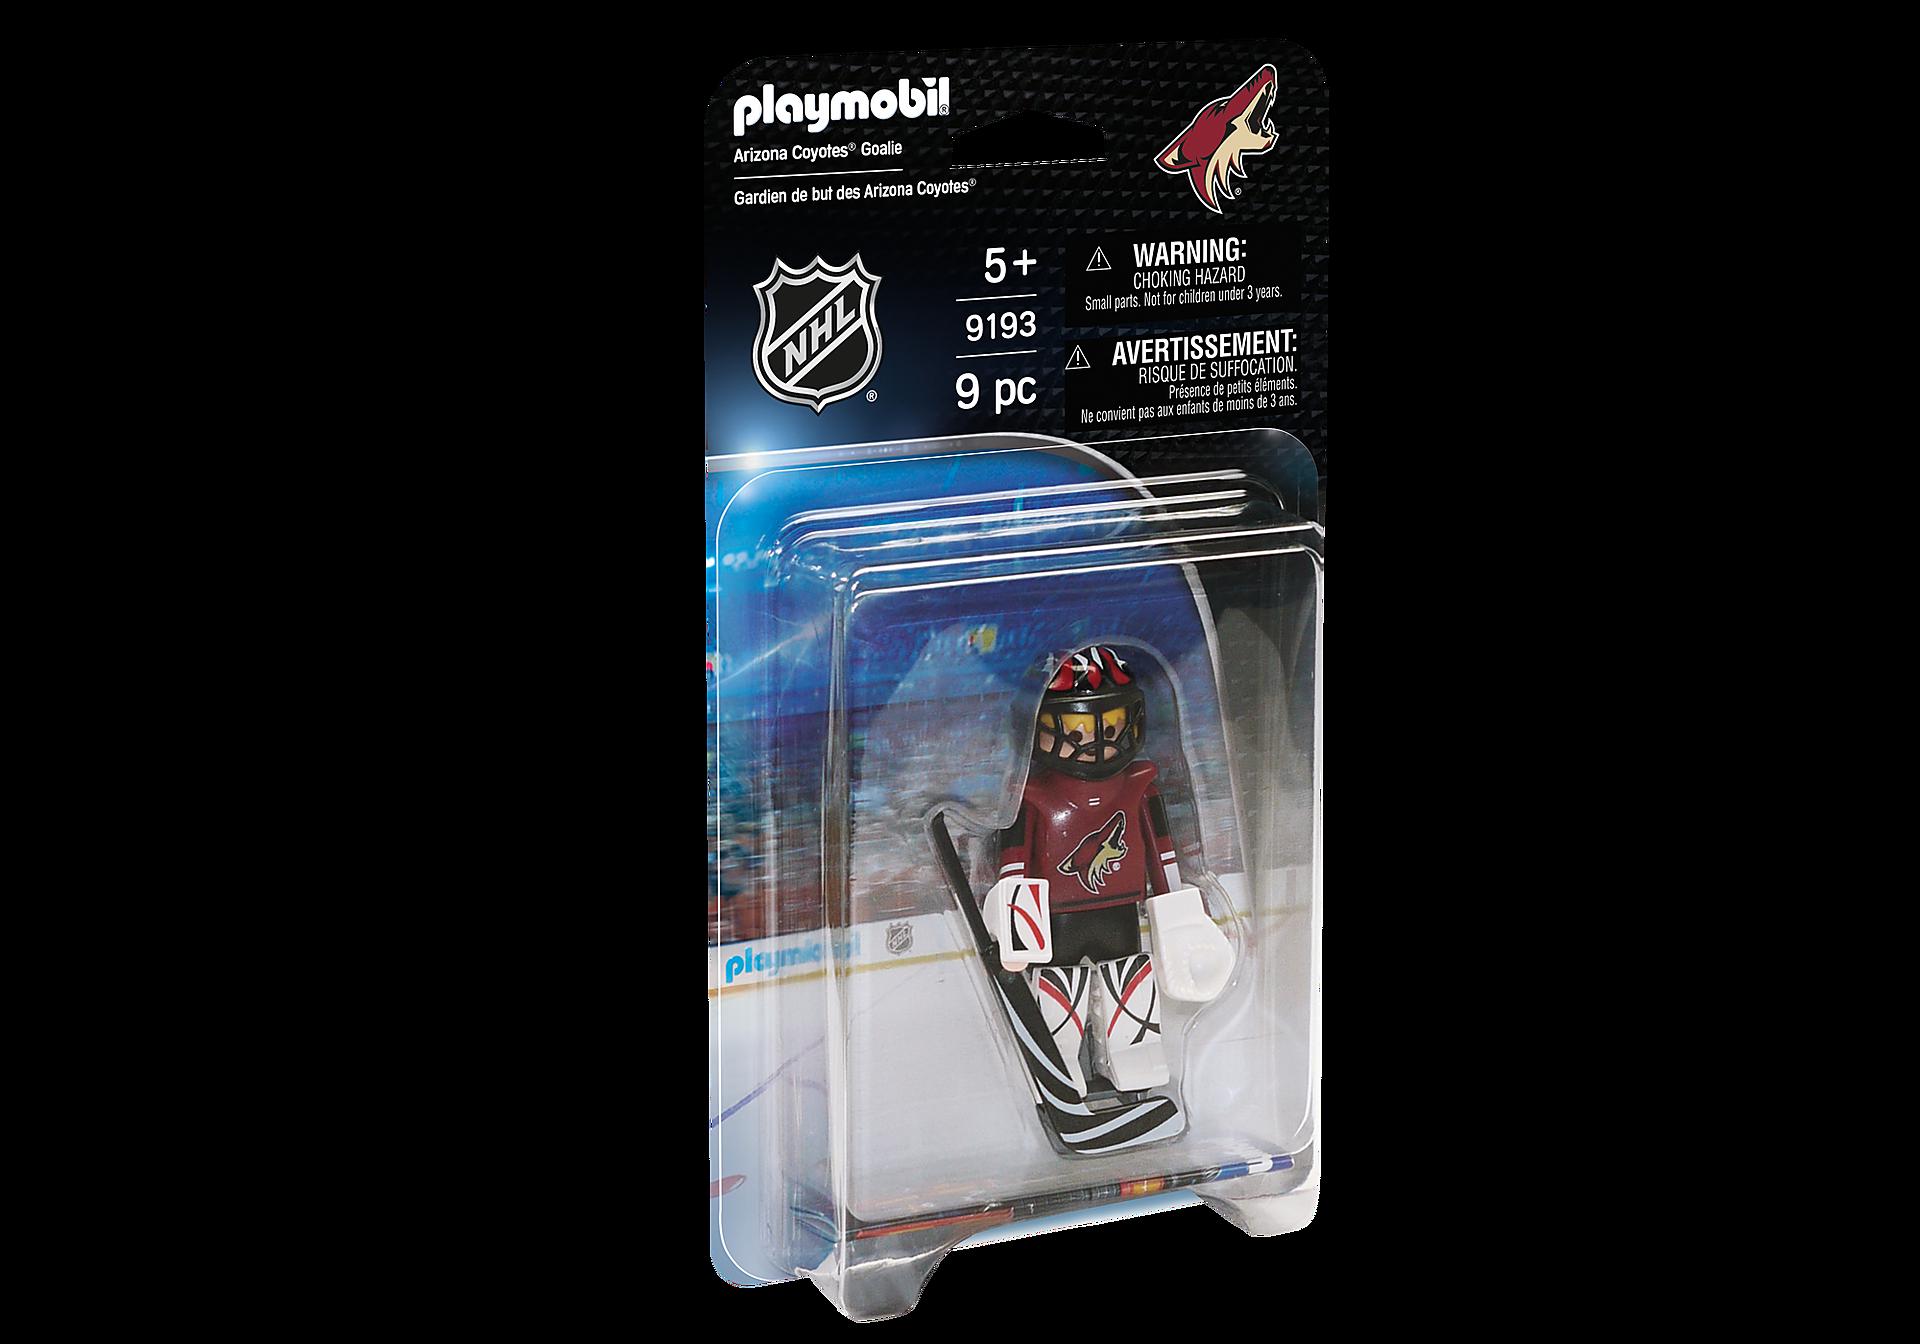 http://media.playmobil.com/i/playmobil/9193_product_box_front/NHL® Arizona Coyotes® Goalie